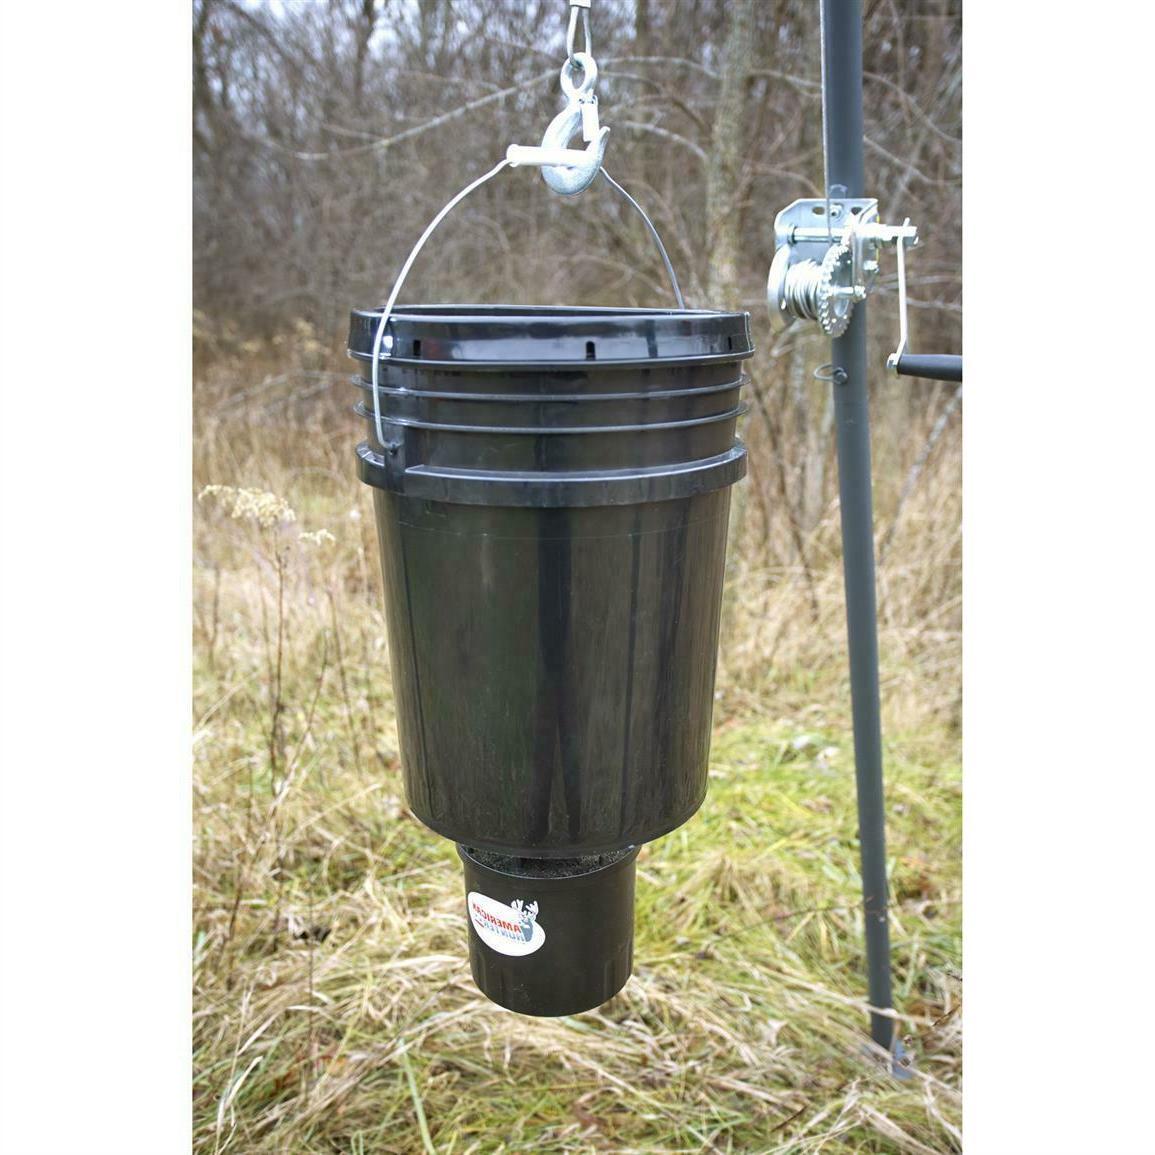 American 5-gallon Hanging Bucket Plastic